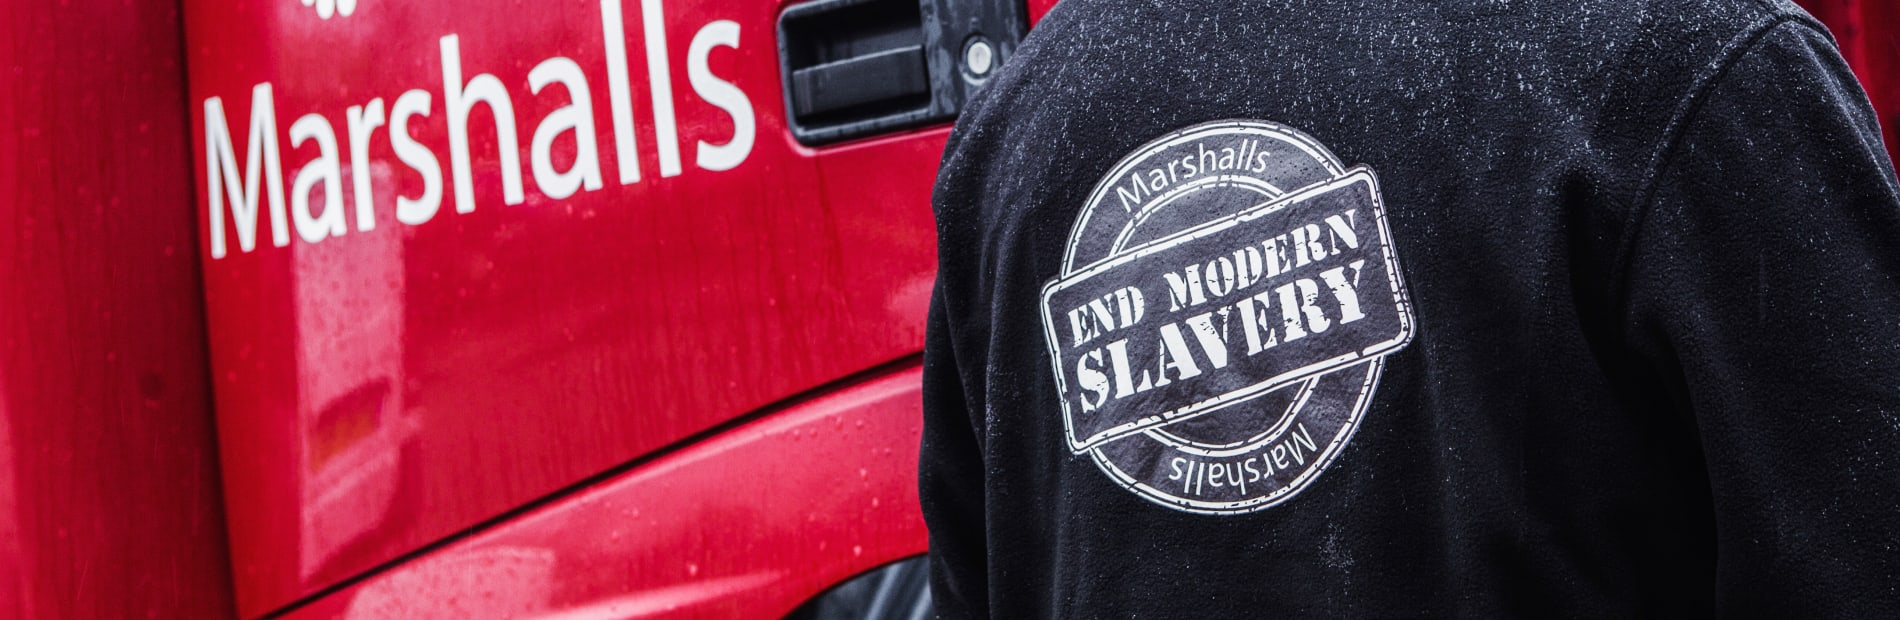 Marshalls End Modern Slavery